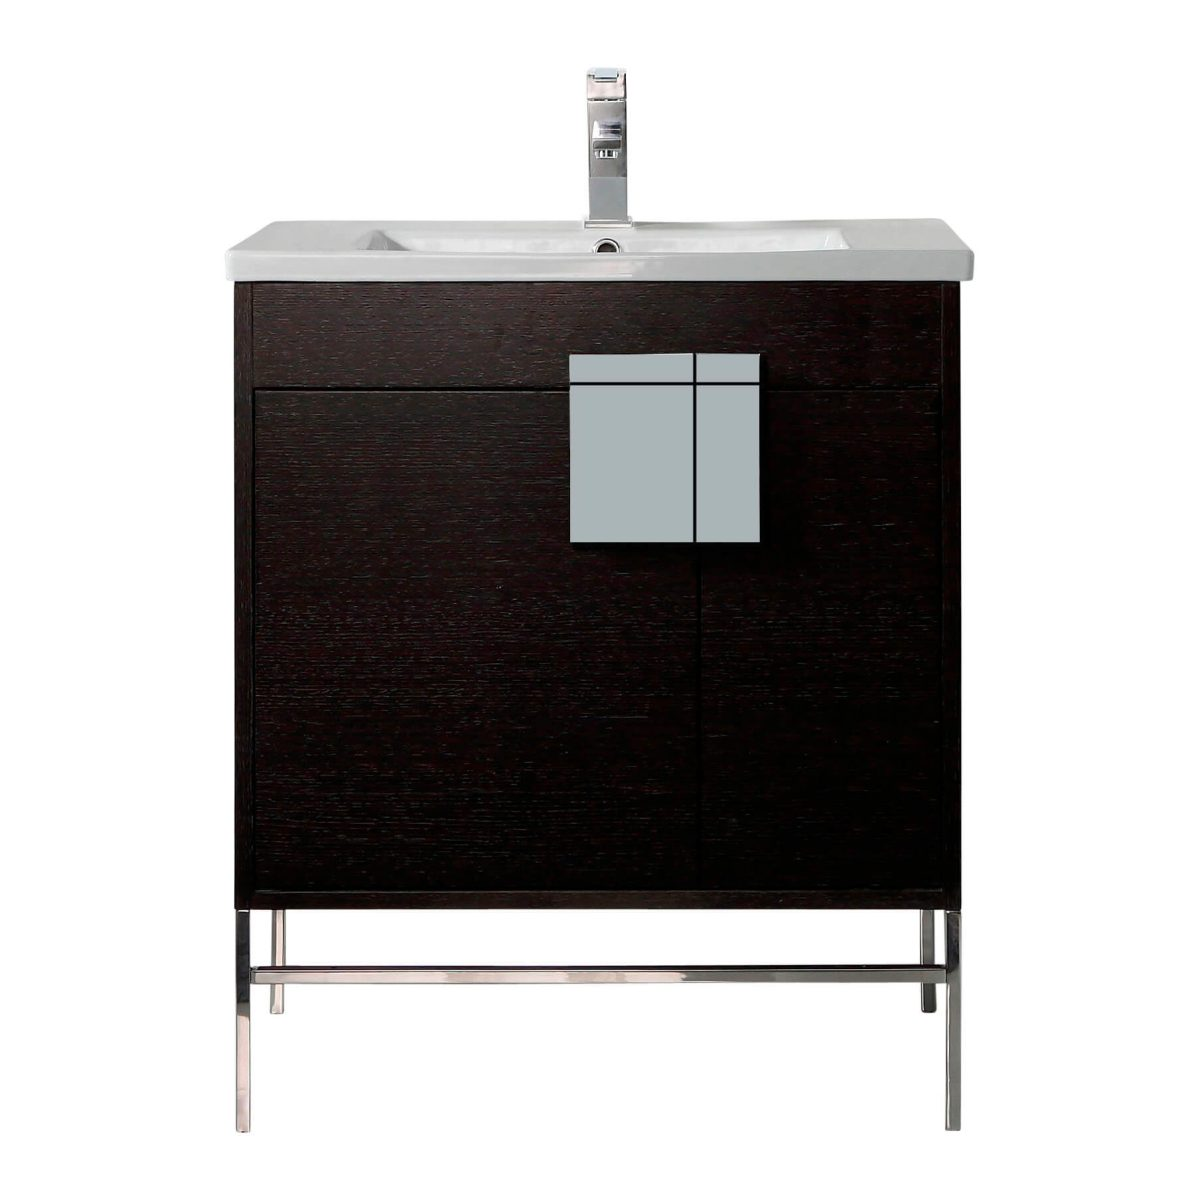 "Shawbridge 30"" Modern Bathroom Vanity  Black Oak Straight Grain with Polished Chrome Hardware"